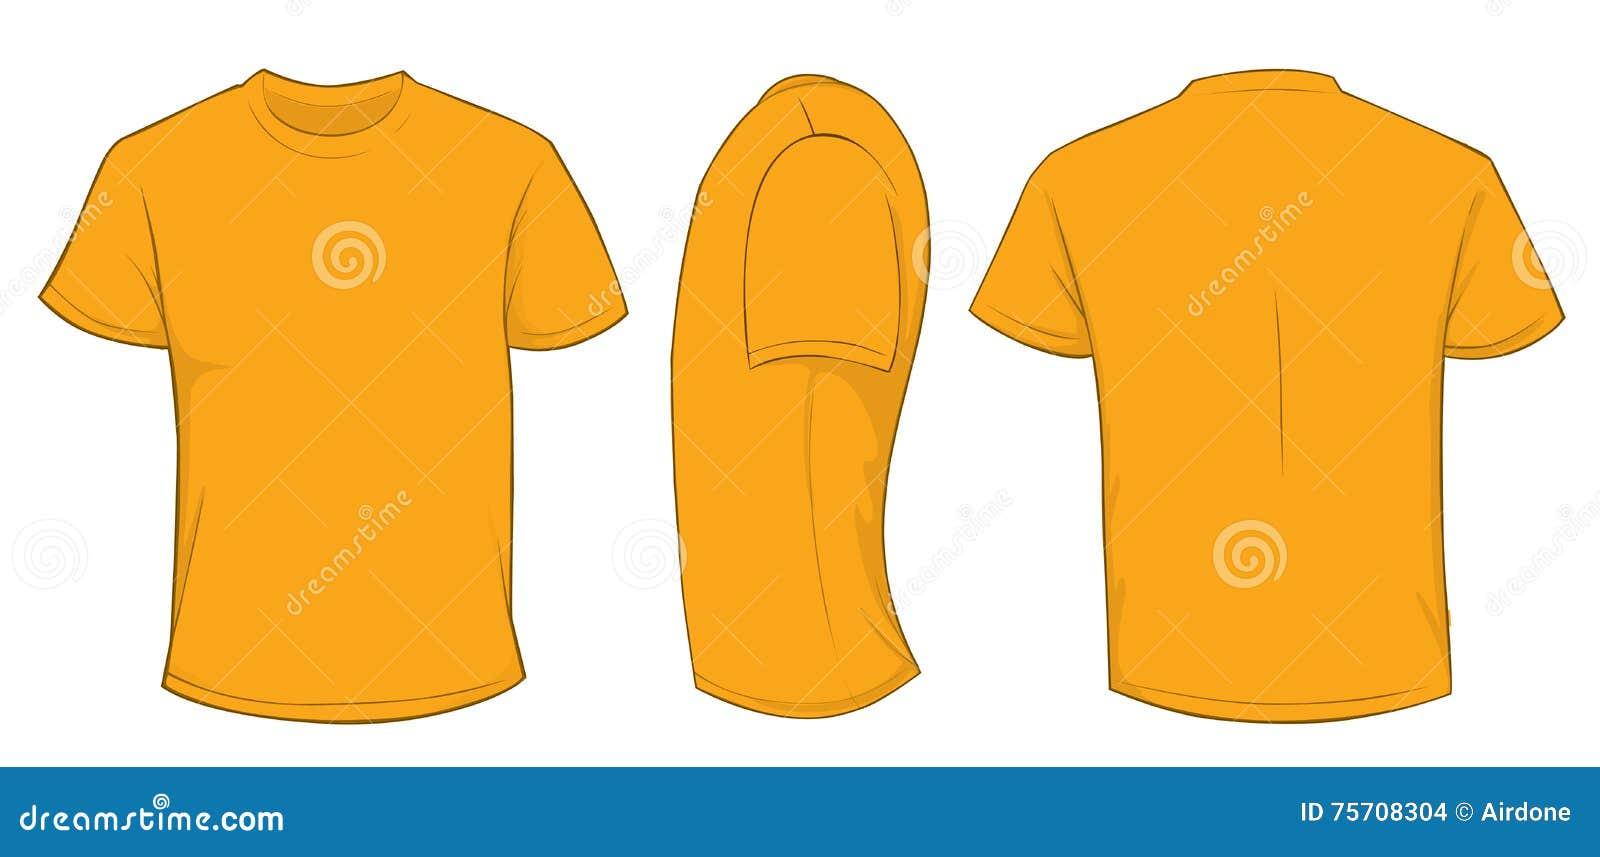 640ceba70 Vector illustration of blank orange men t-shirt template, front, side and back  design isolated on white